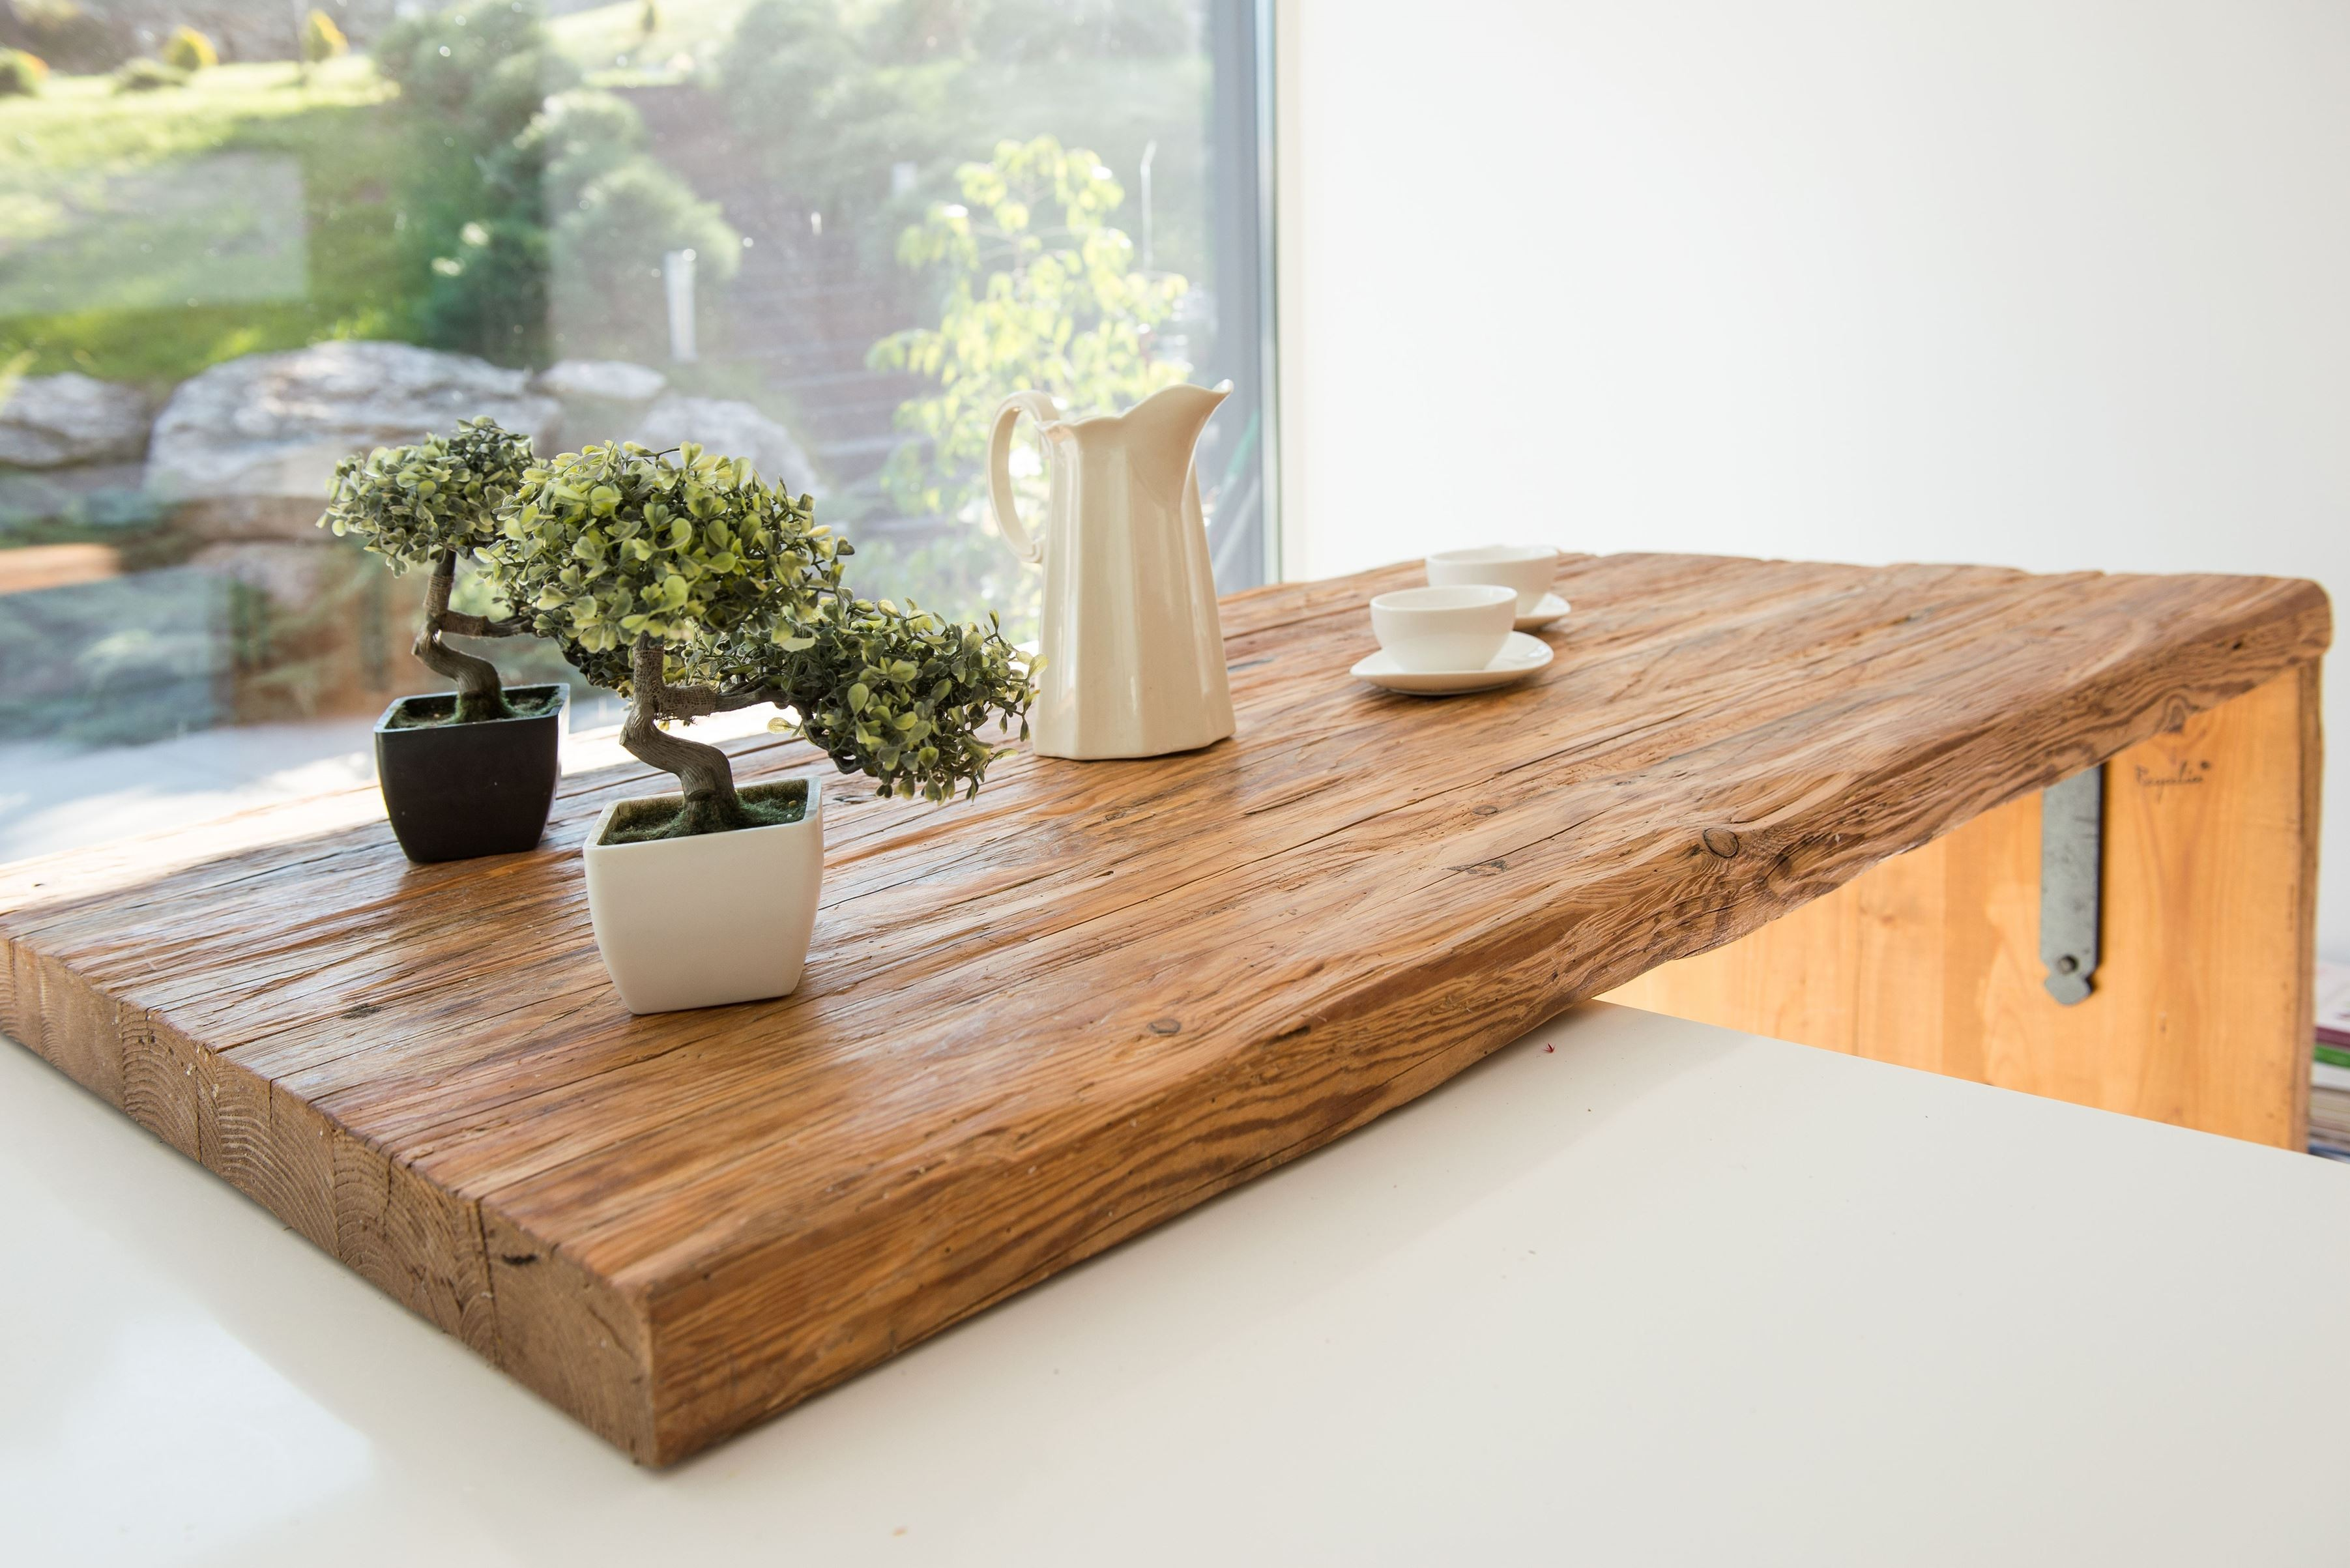 meble-drewniane-barek-ze-starego-drewna-recznie-ciosanego-stolik-ze-starego-drewna-recznie-ciosanego